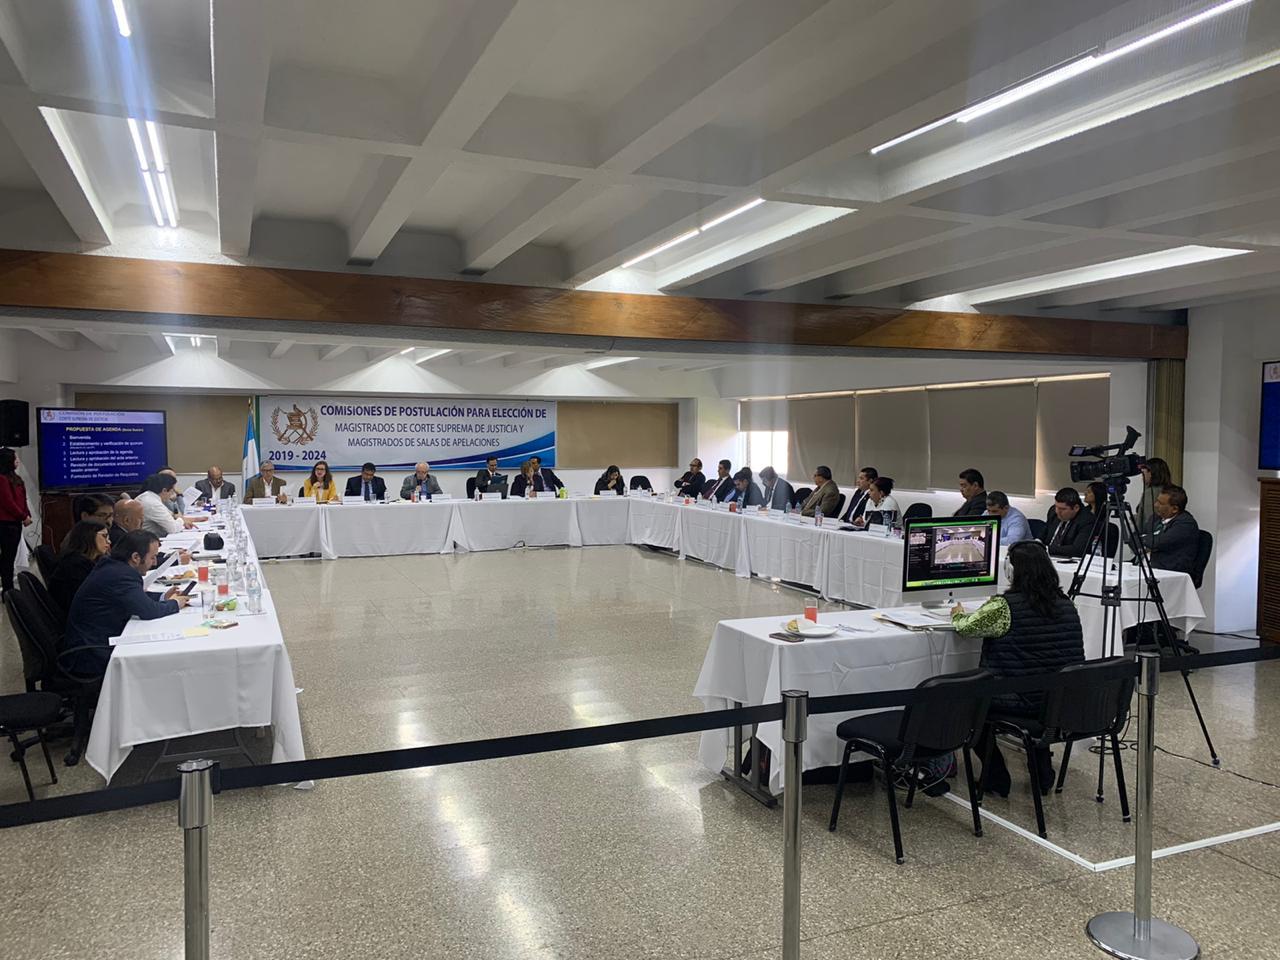 Sexta reunión comisión de postulación a magistrados de la CSJ.